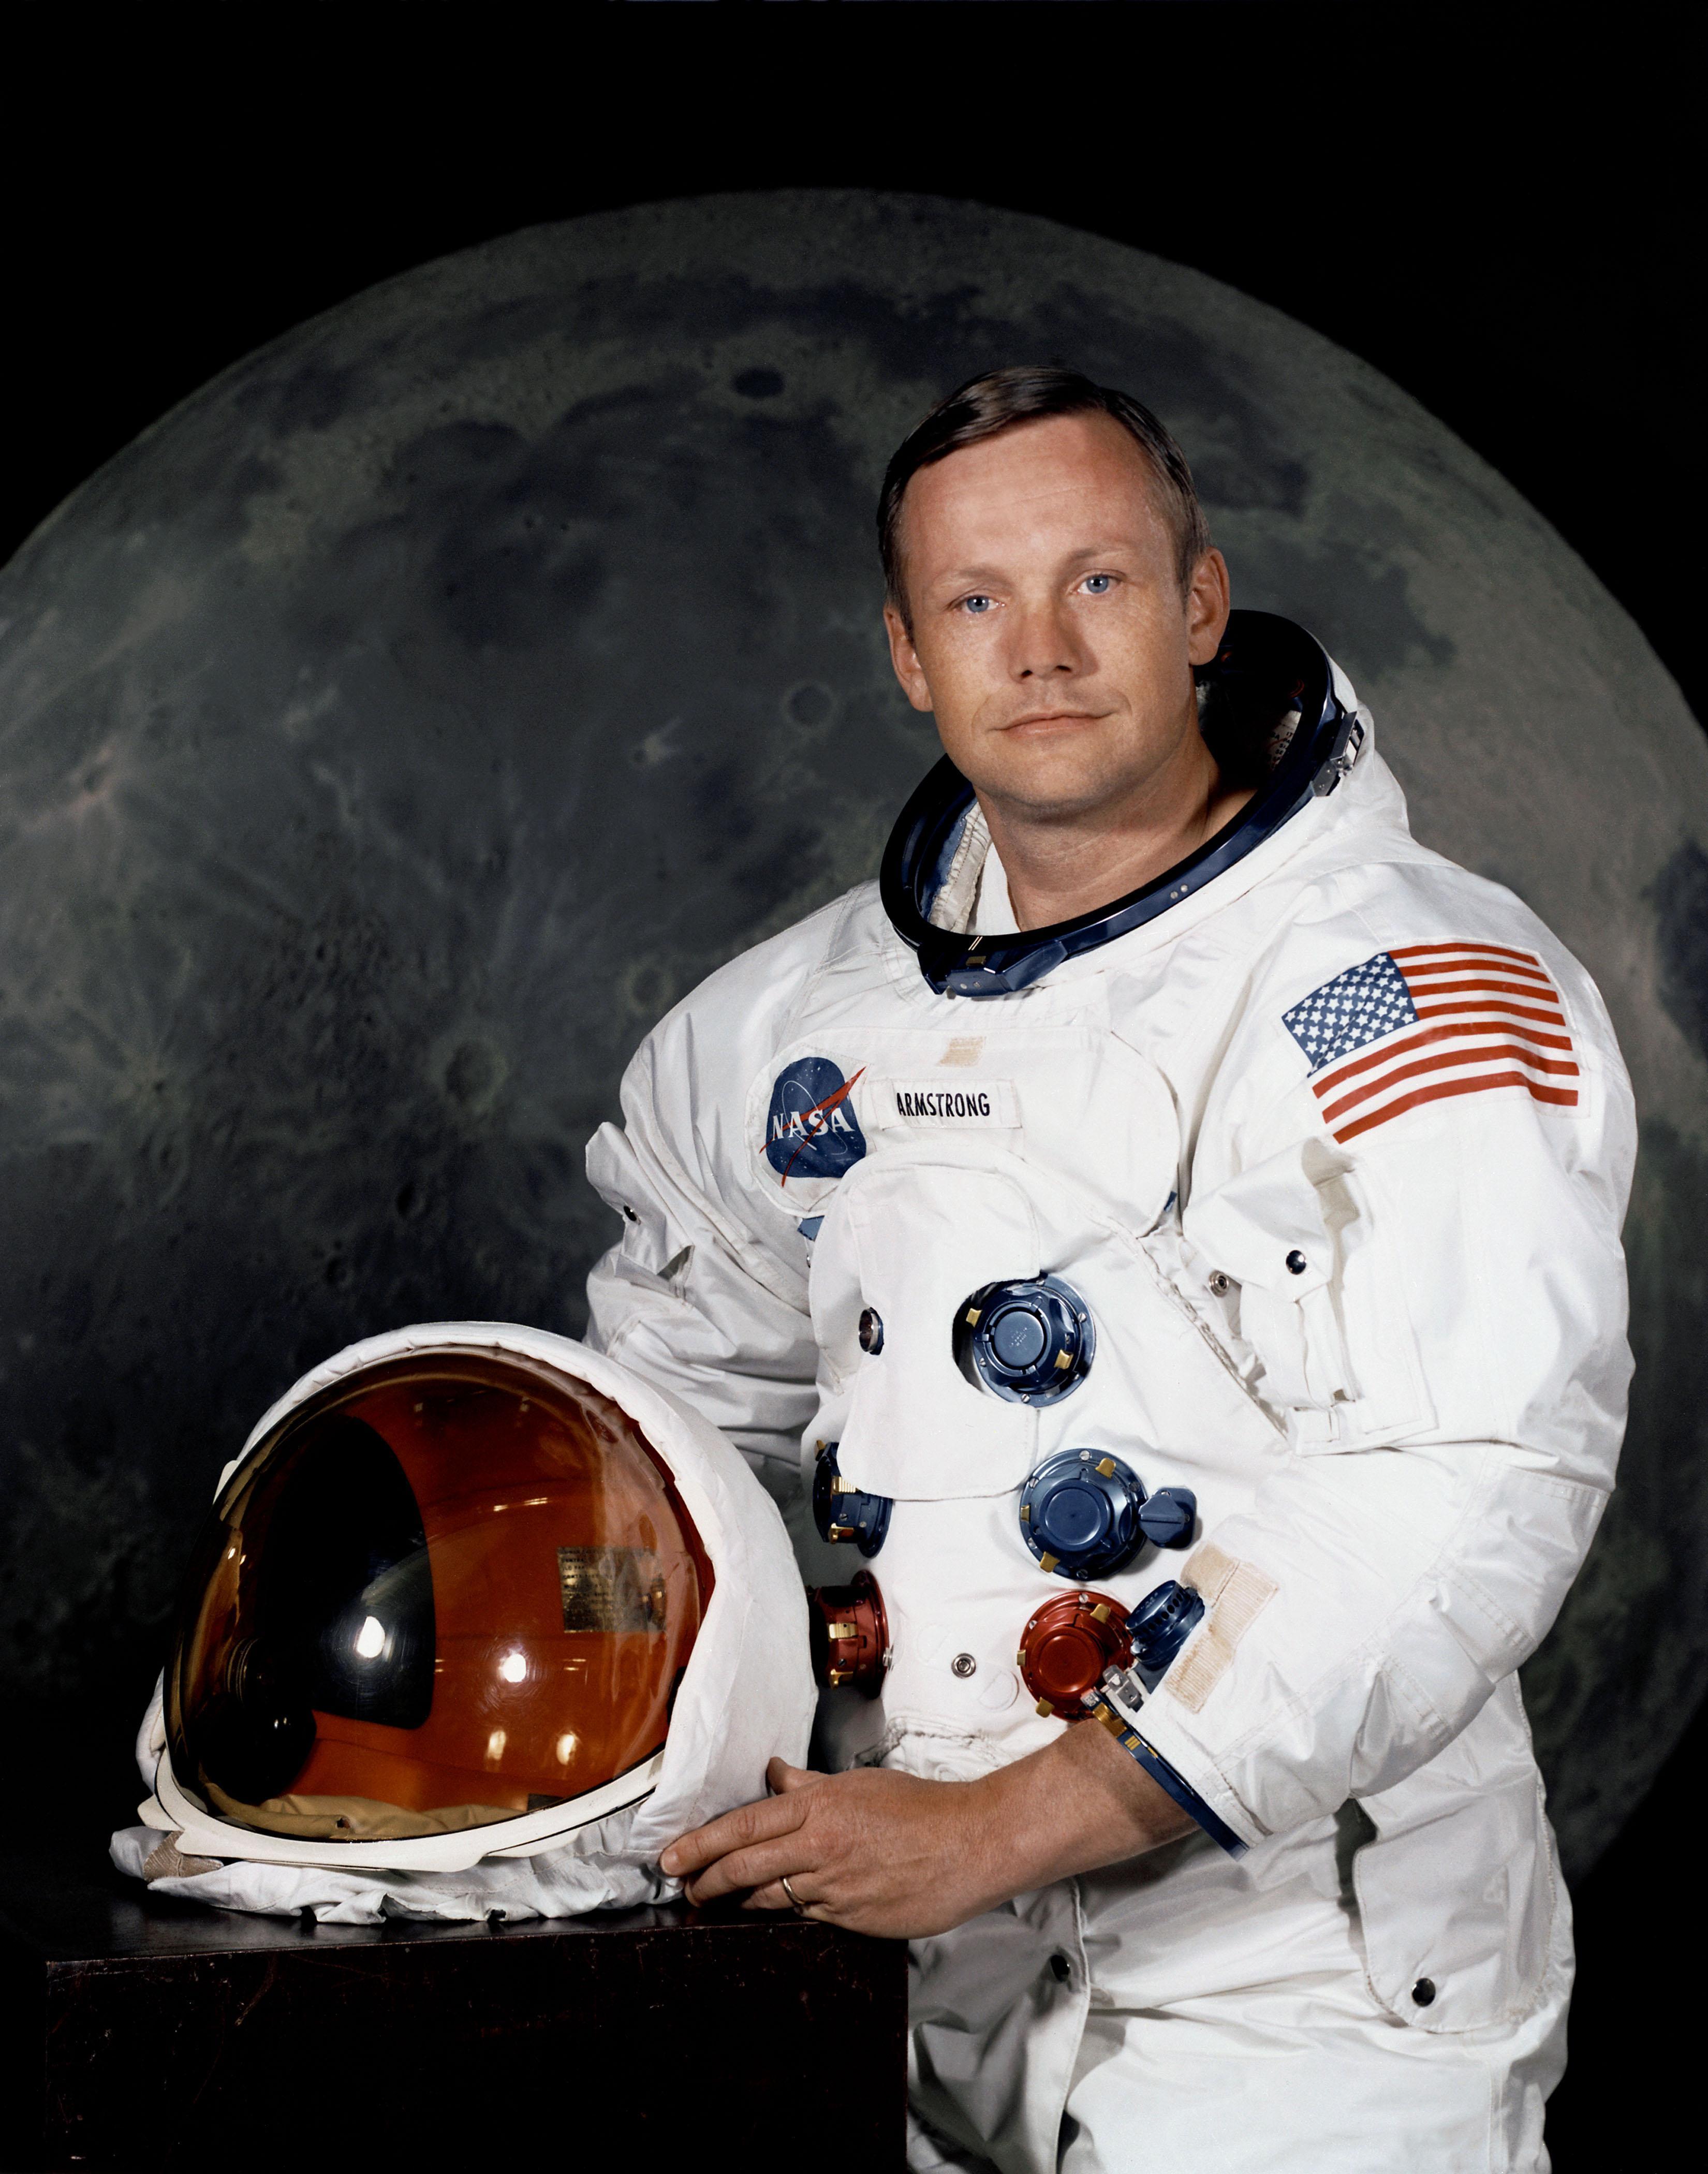 bb05fbd359c30afa0f53_Neil_Armstrong.jpg